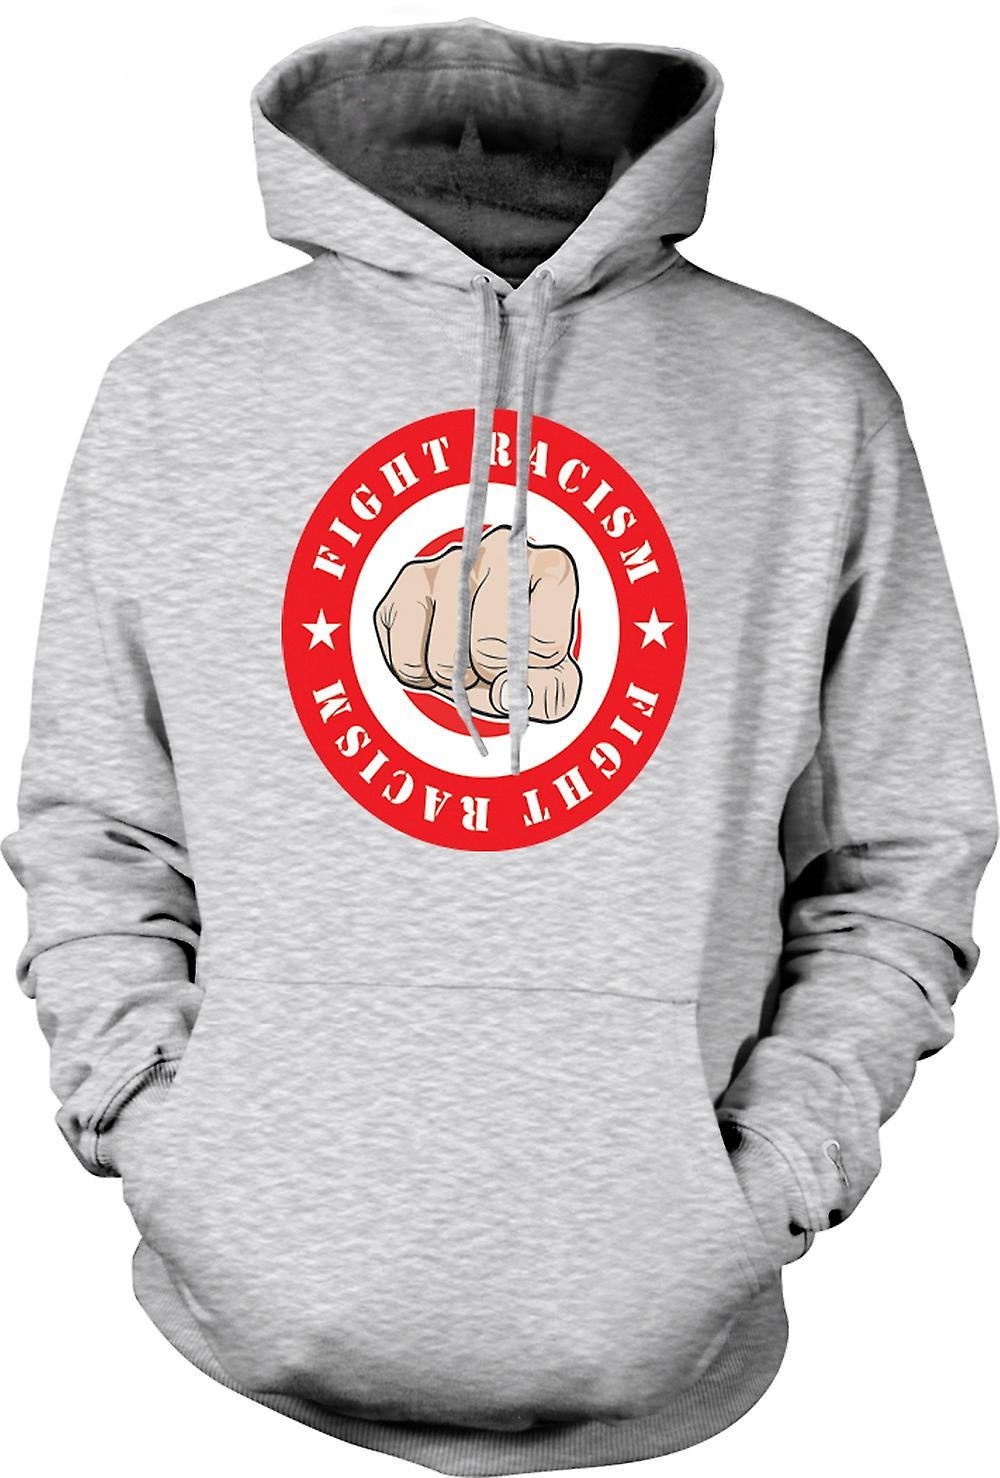 Mens Hoodie - Fight Racism Logo - Cool